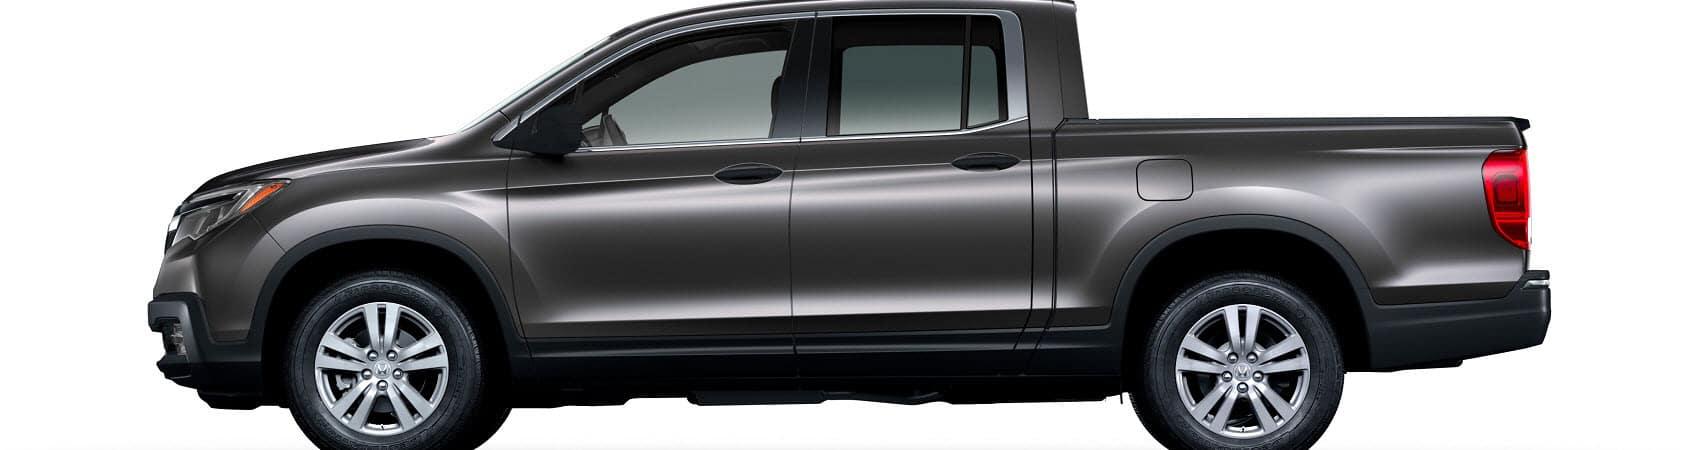 Honda Ridgeline Modern Steel Metallic